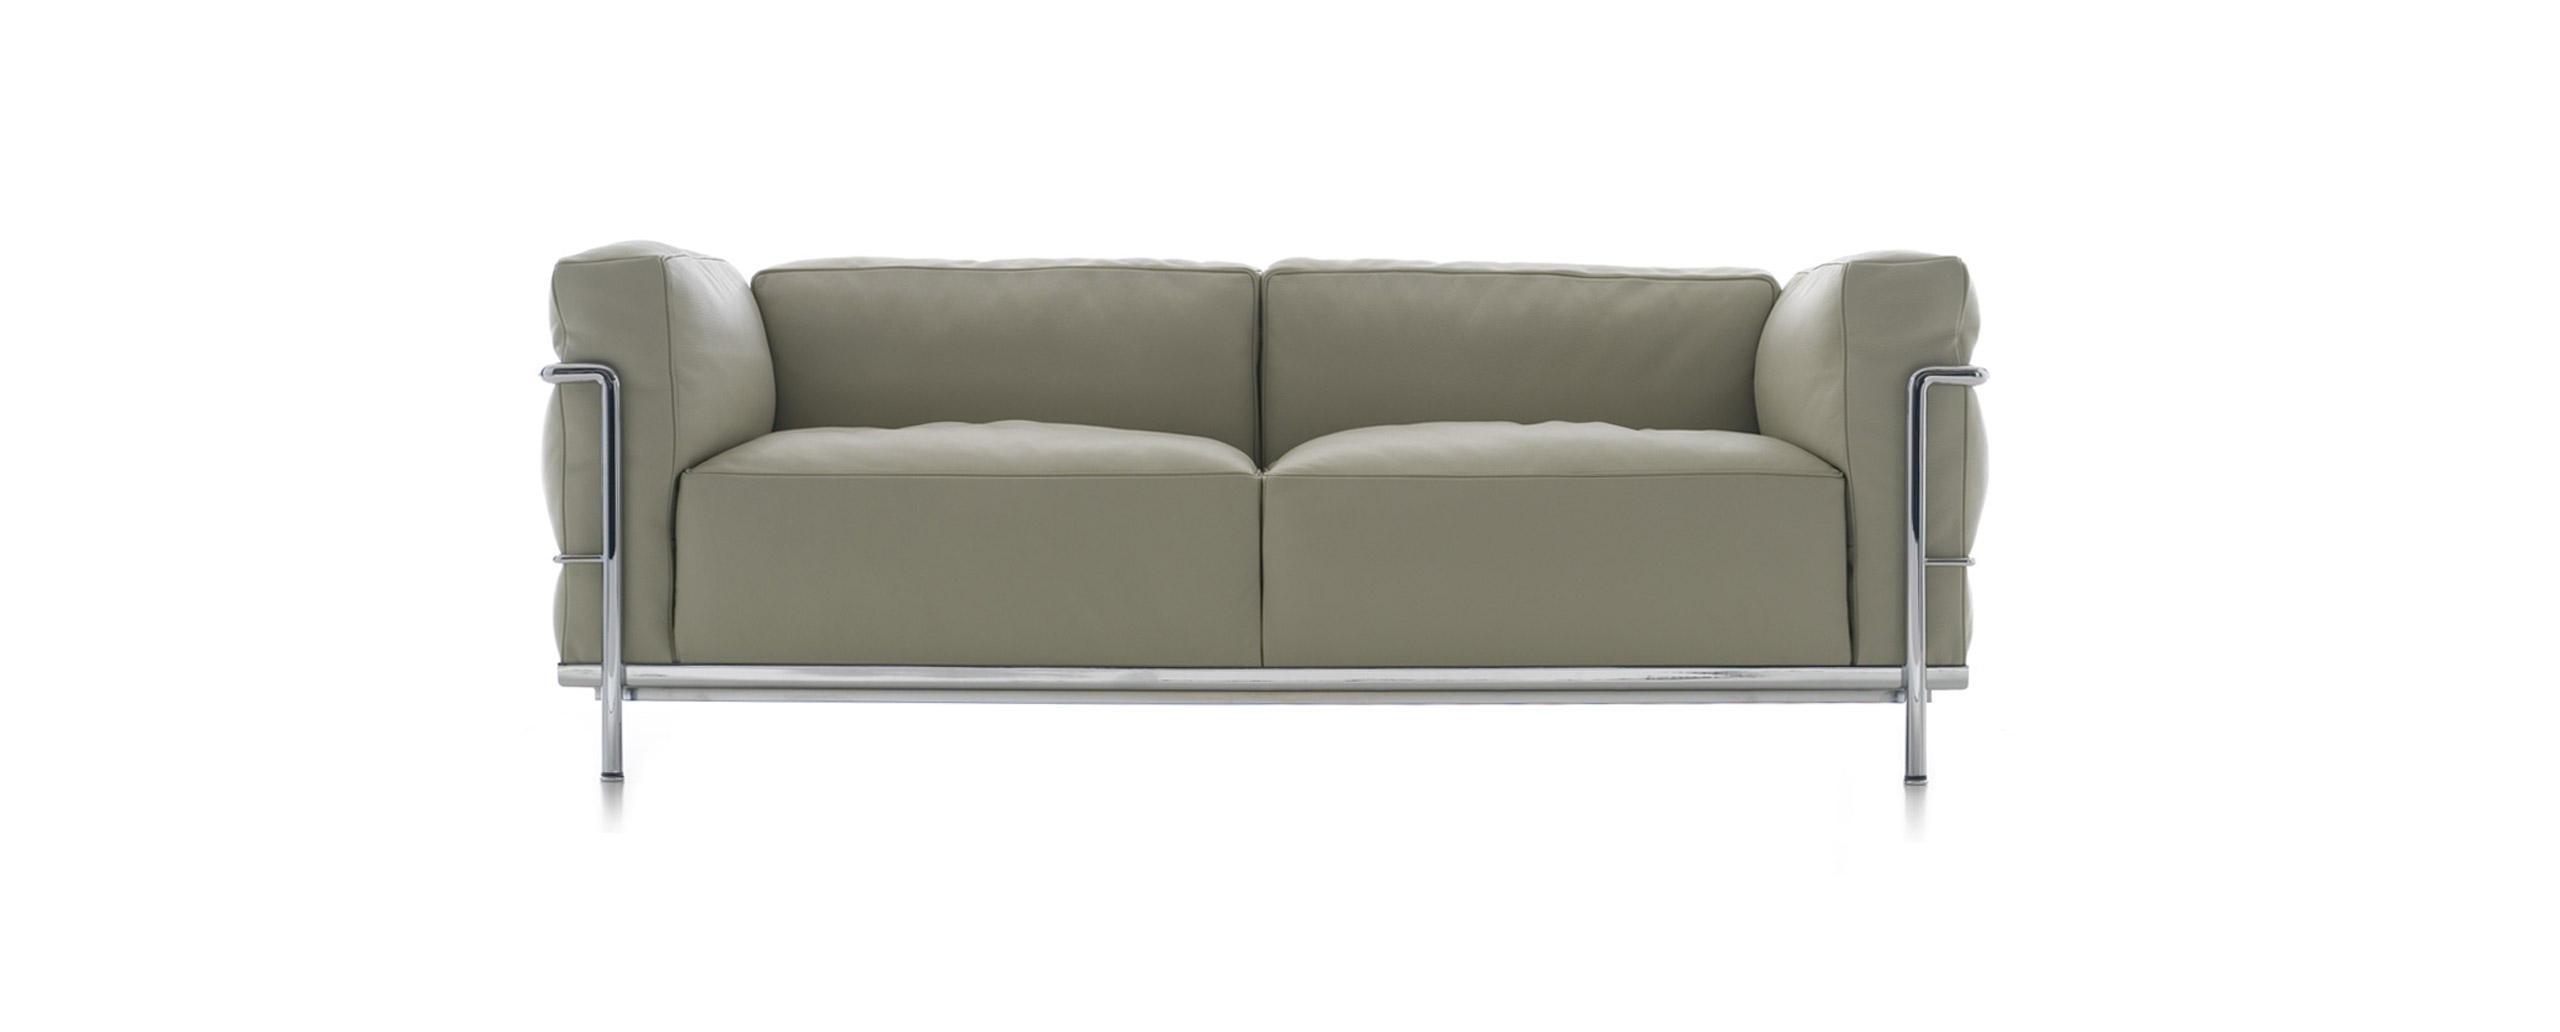 lc3 cassina le corbusier. Black Bedroom Furniture Sets. Home Design Ideas